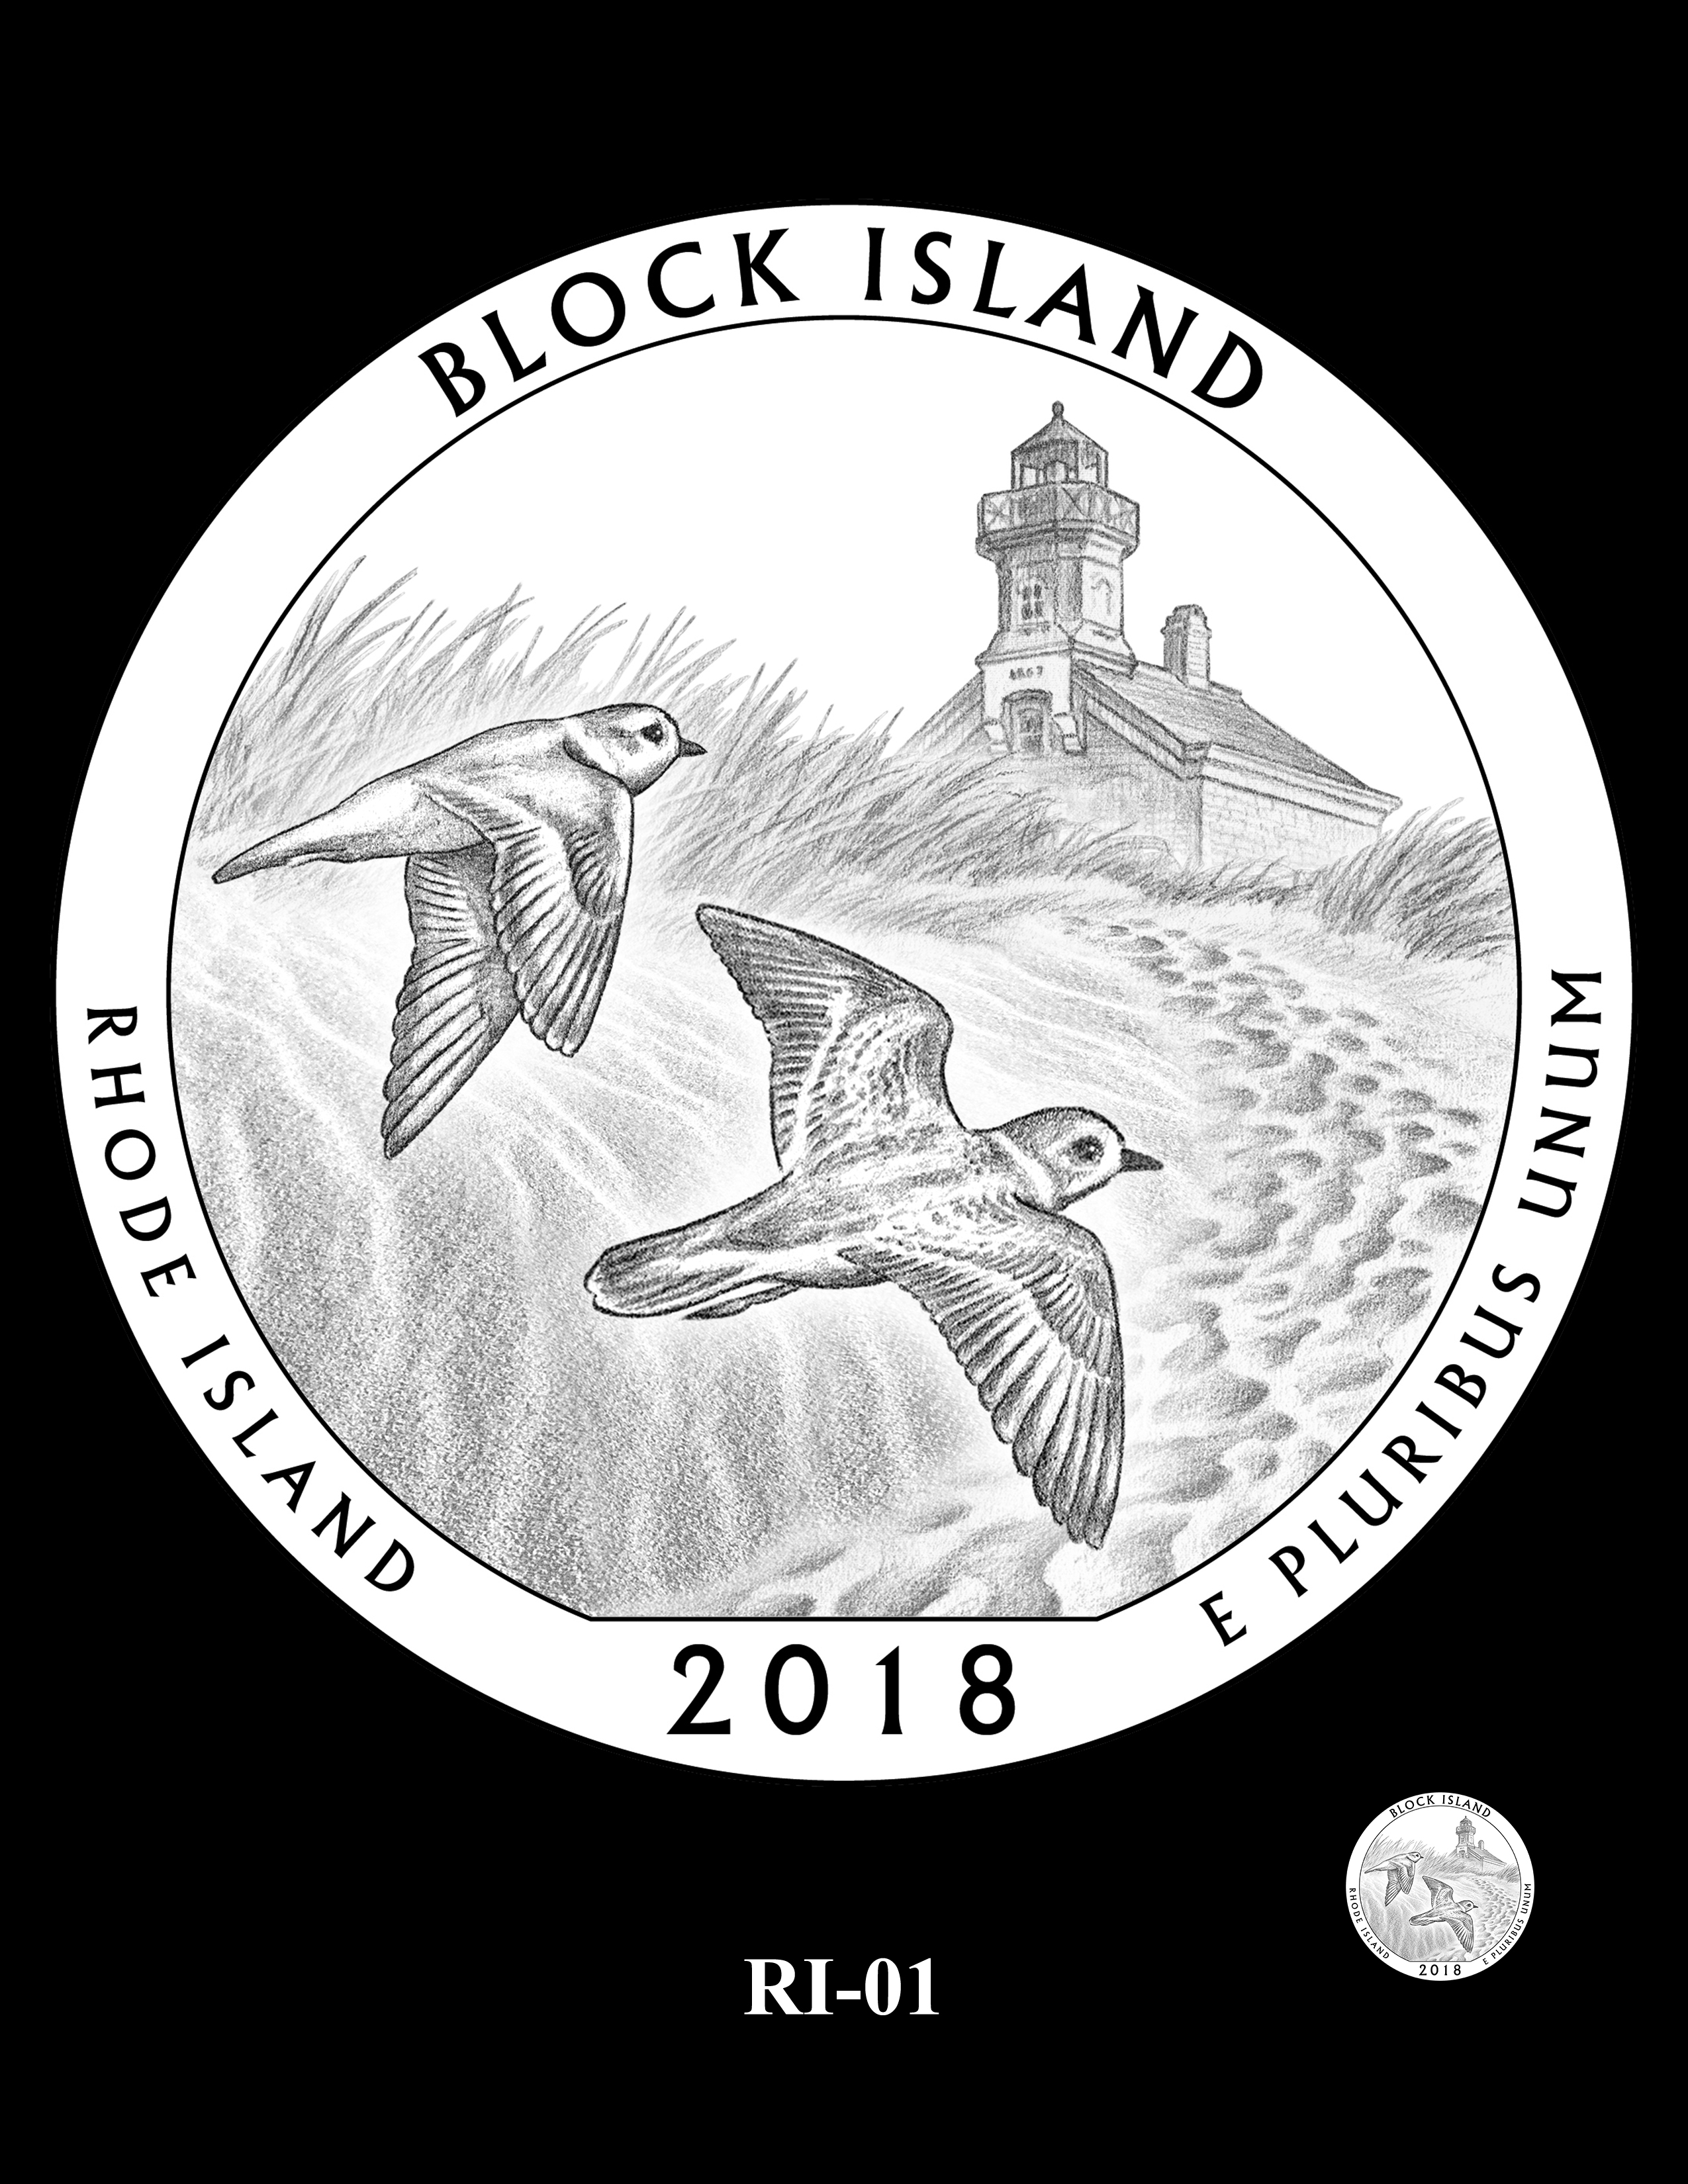 RI-01 -- 2018 America the Beautiful® Quarters Program